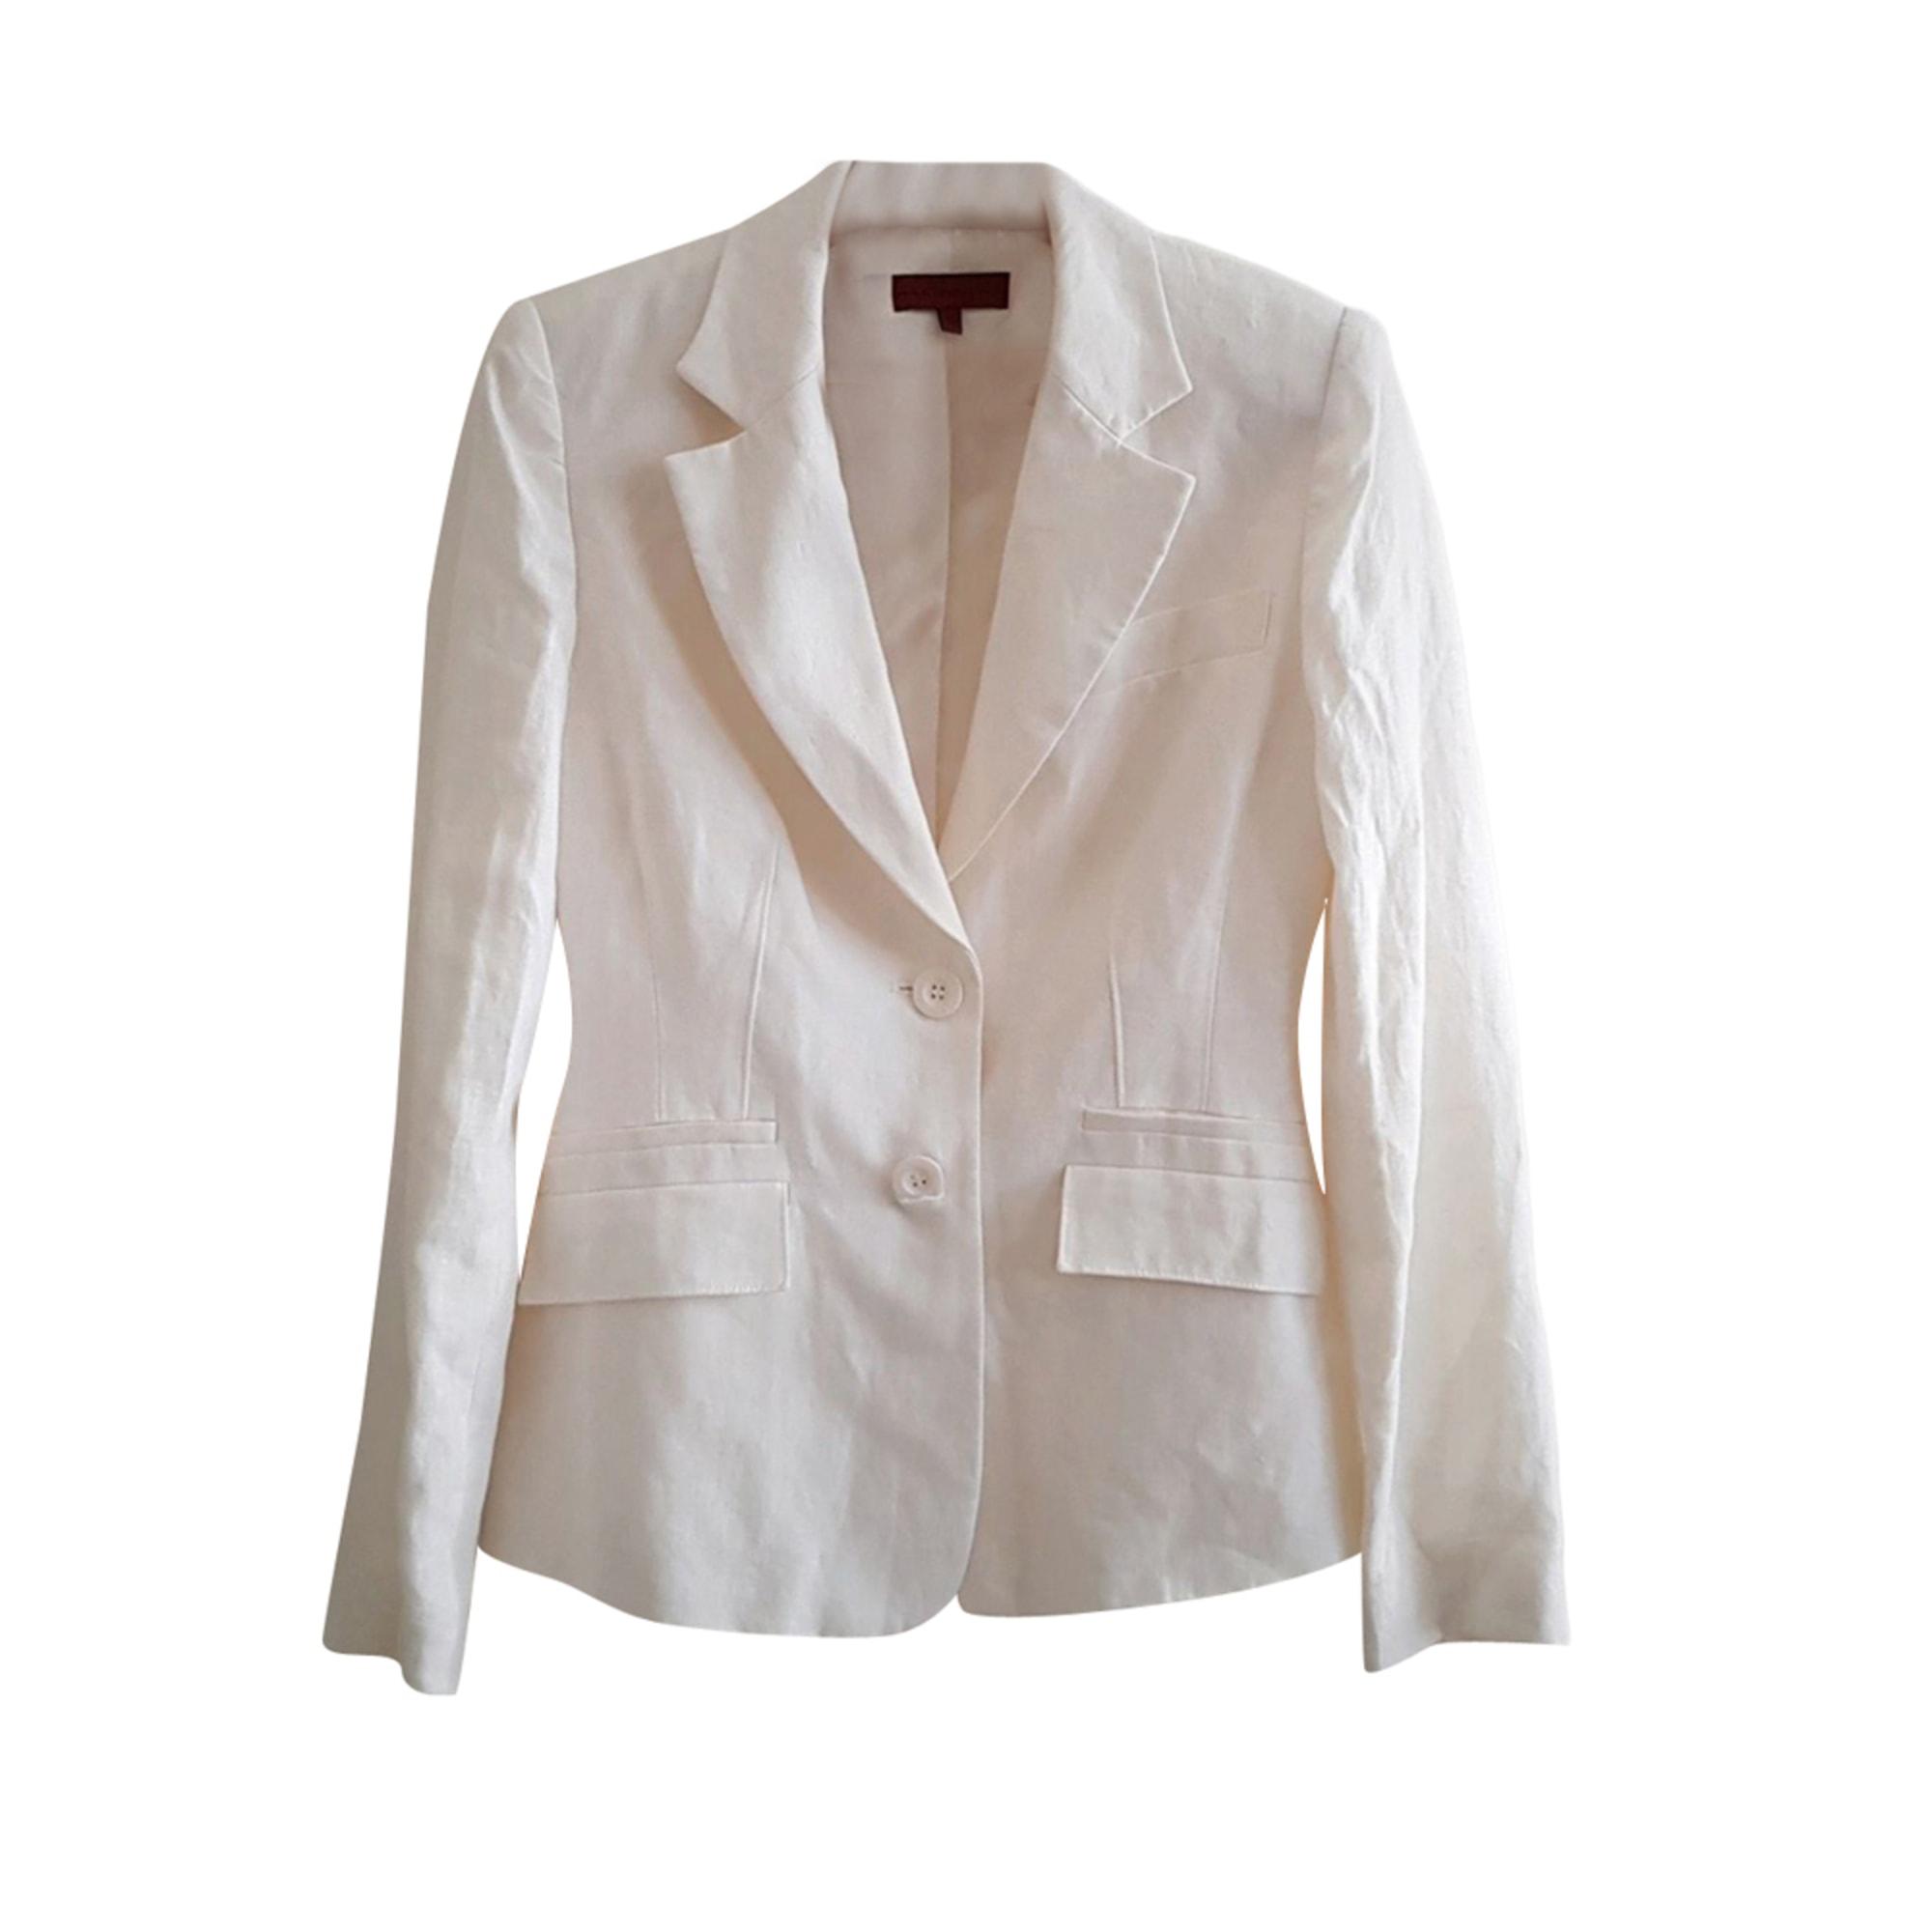 Blazer, veste tailleur JOHN RICHMOND Blanc, blanc cassé, écru